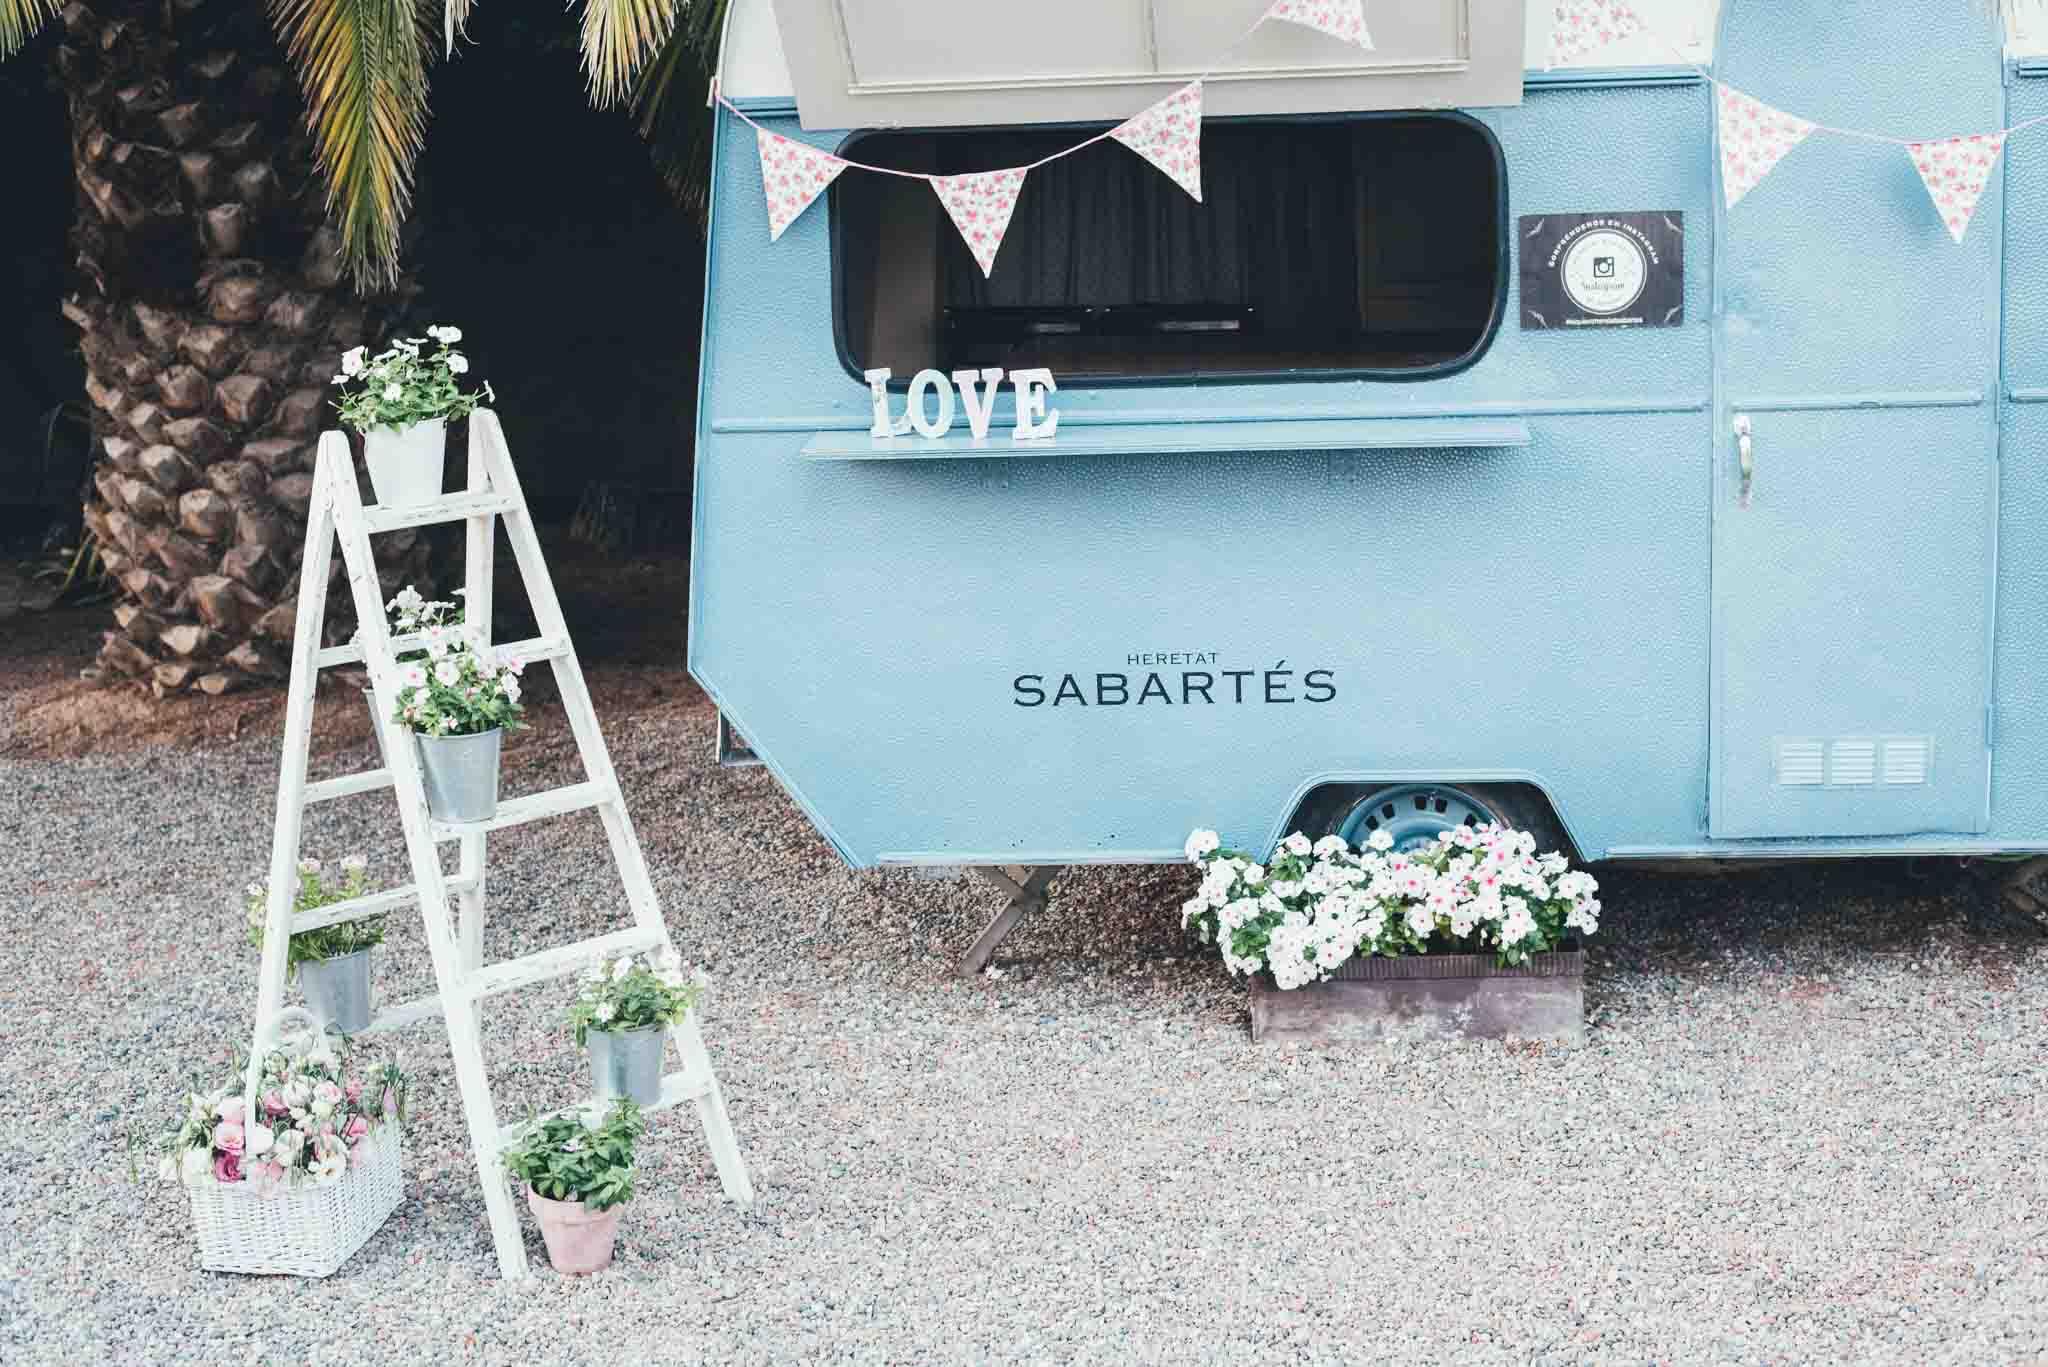 Boda-Heretat-Sabartes-Tarragona-Fotografía-Laura-Arroyo-DSC_9193